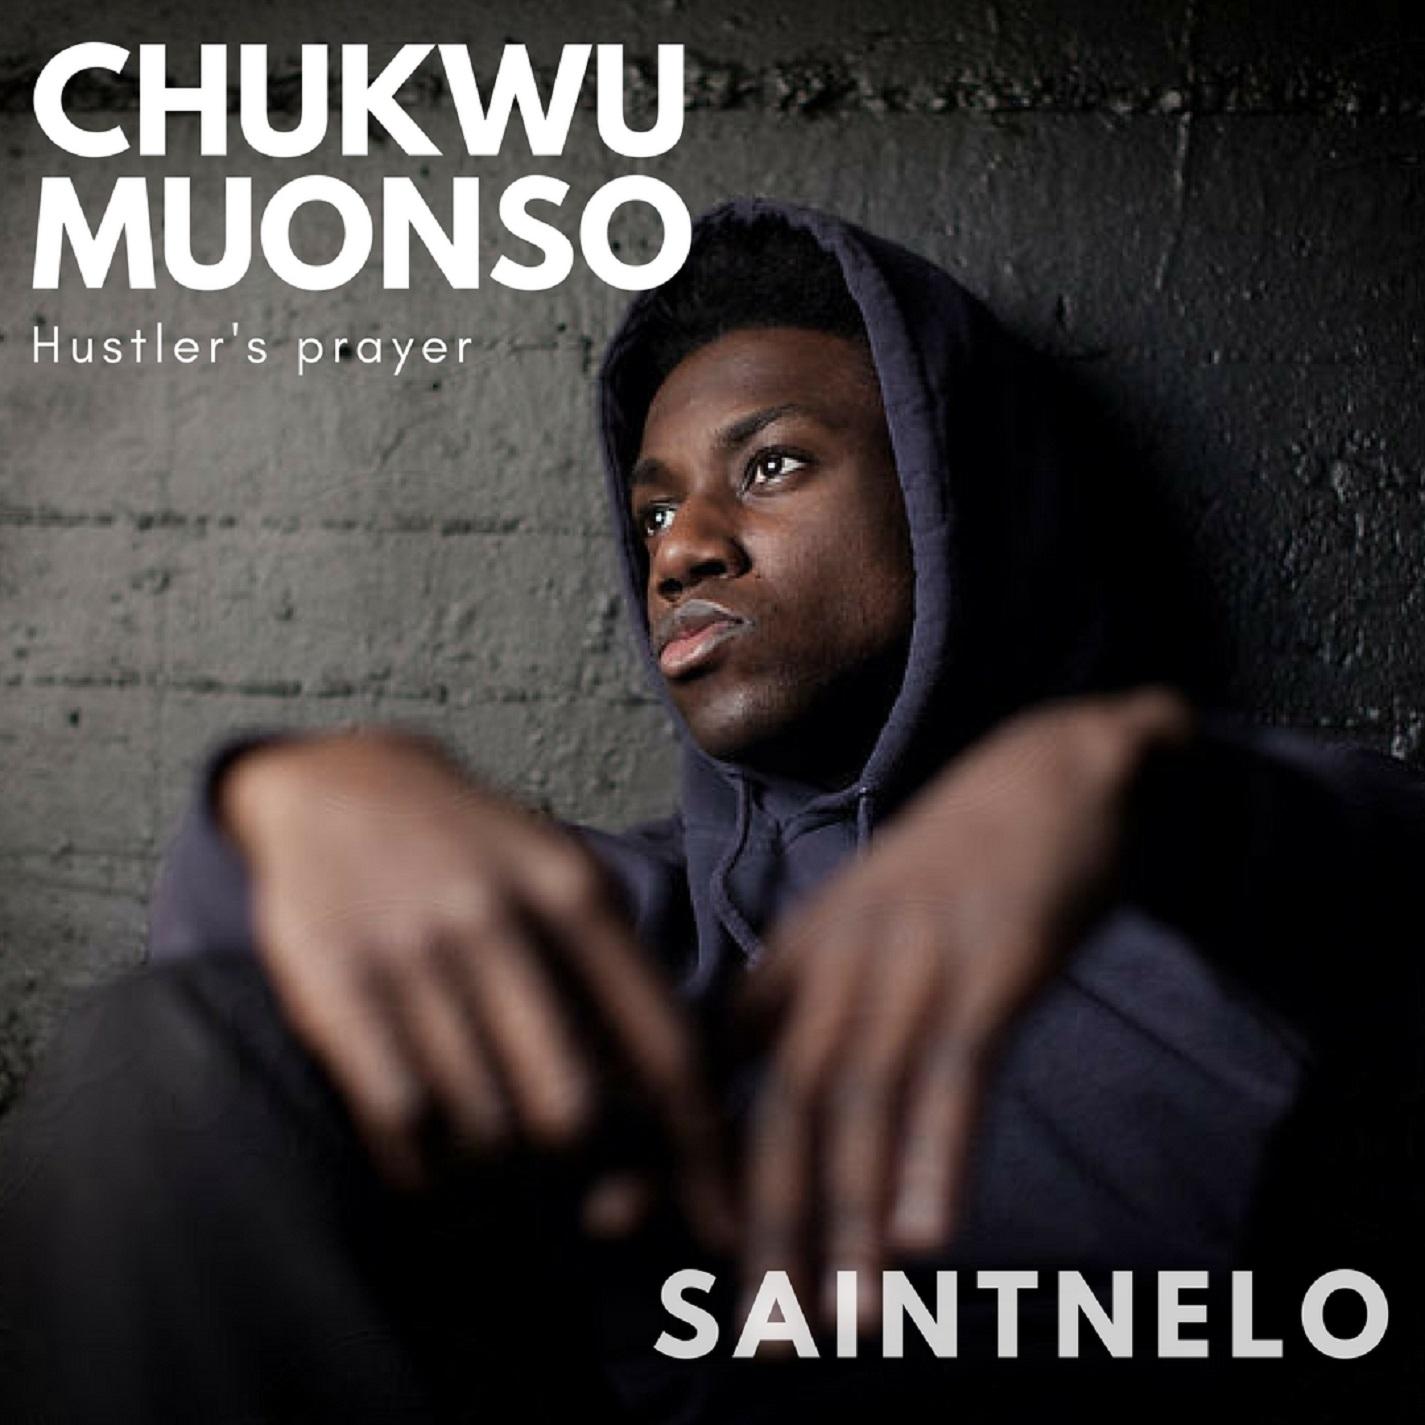 Chukwu Muonso (Hustler's Prayer) by Saintnelo